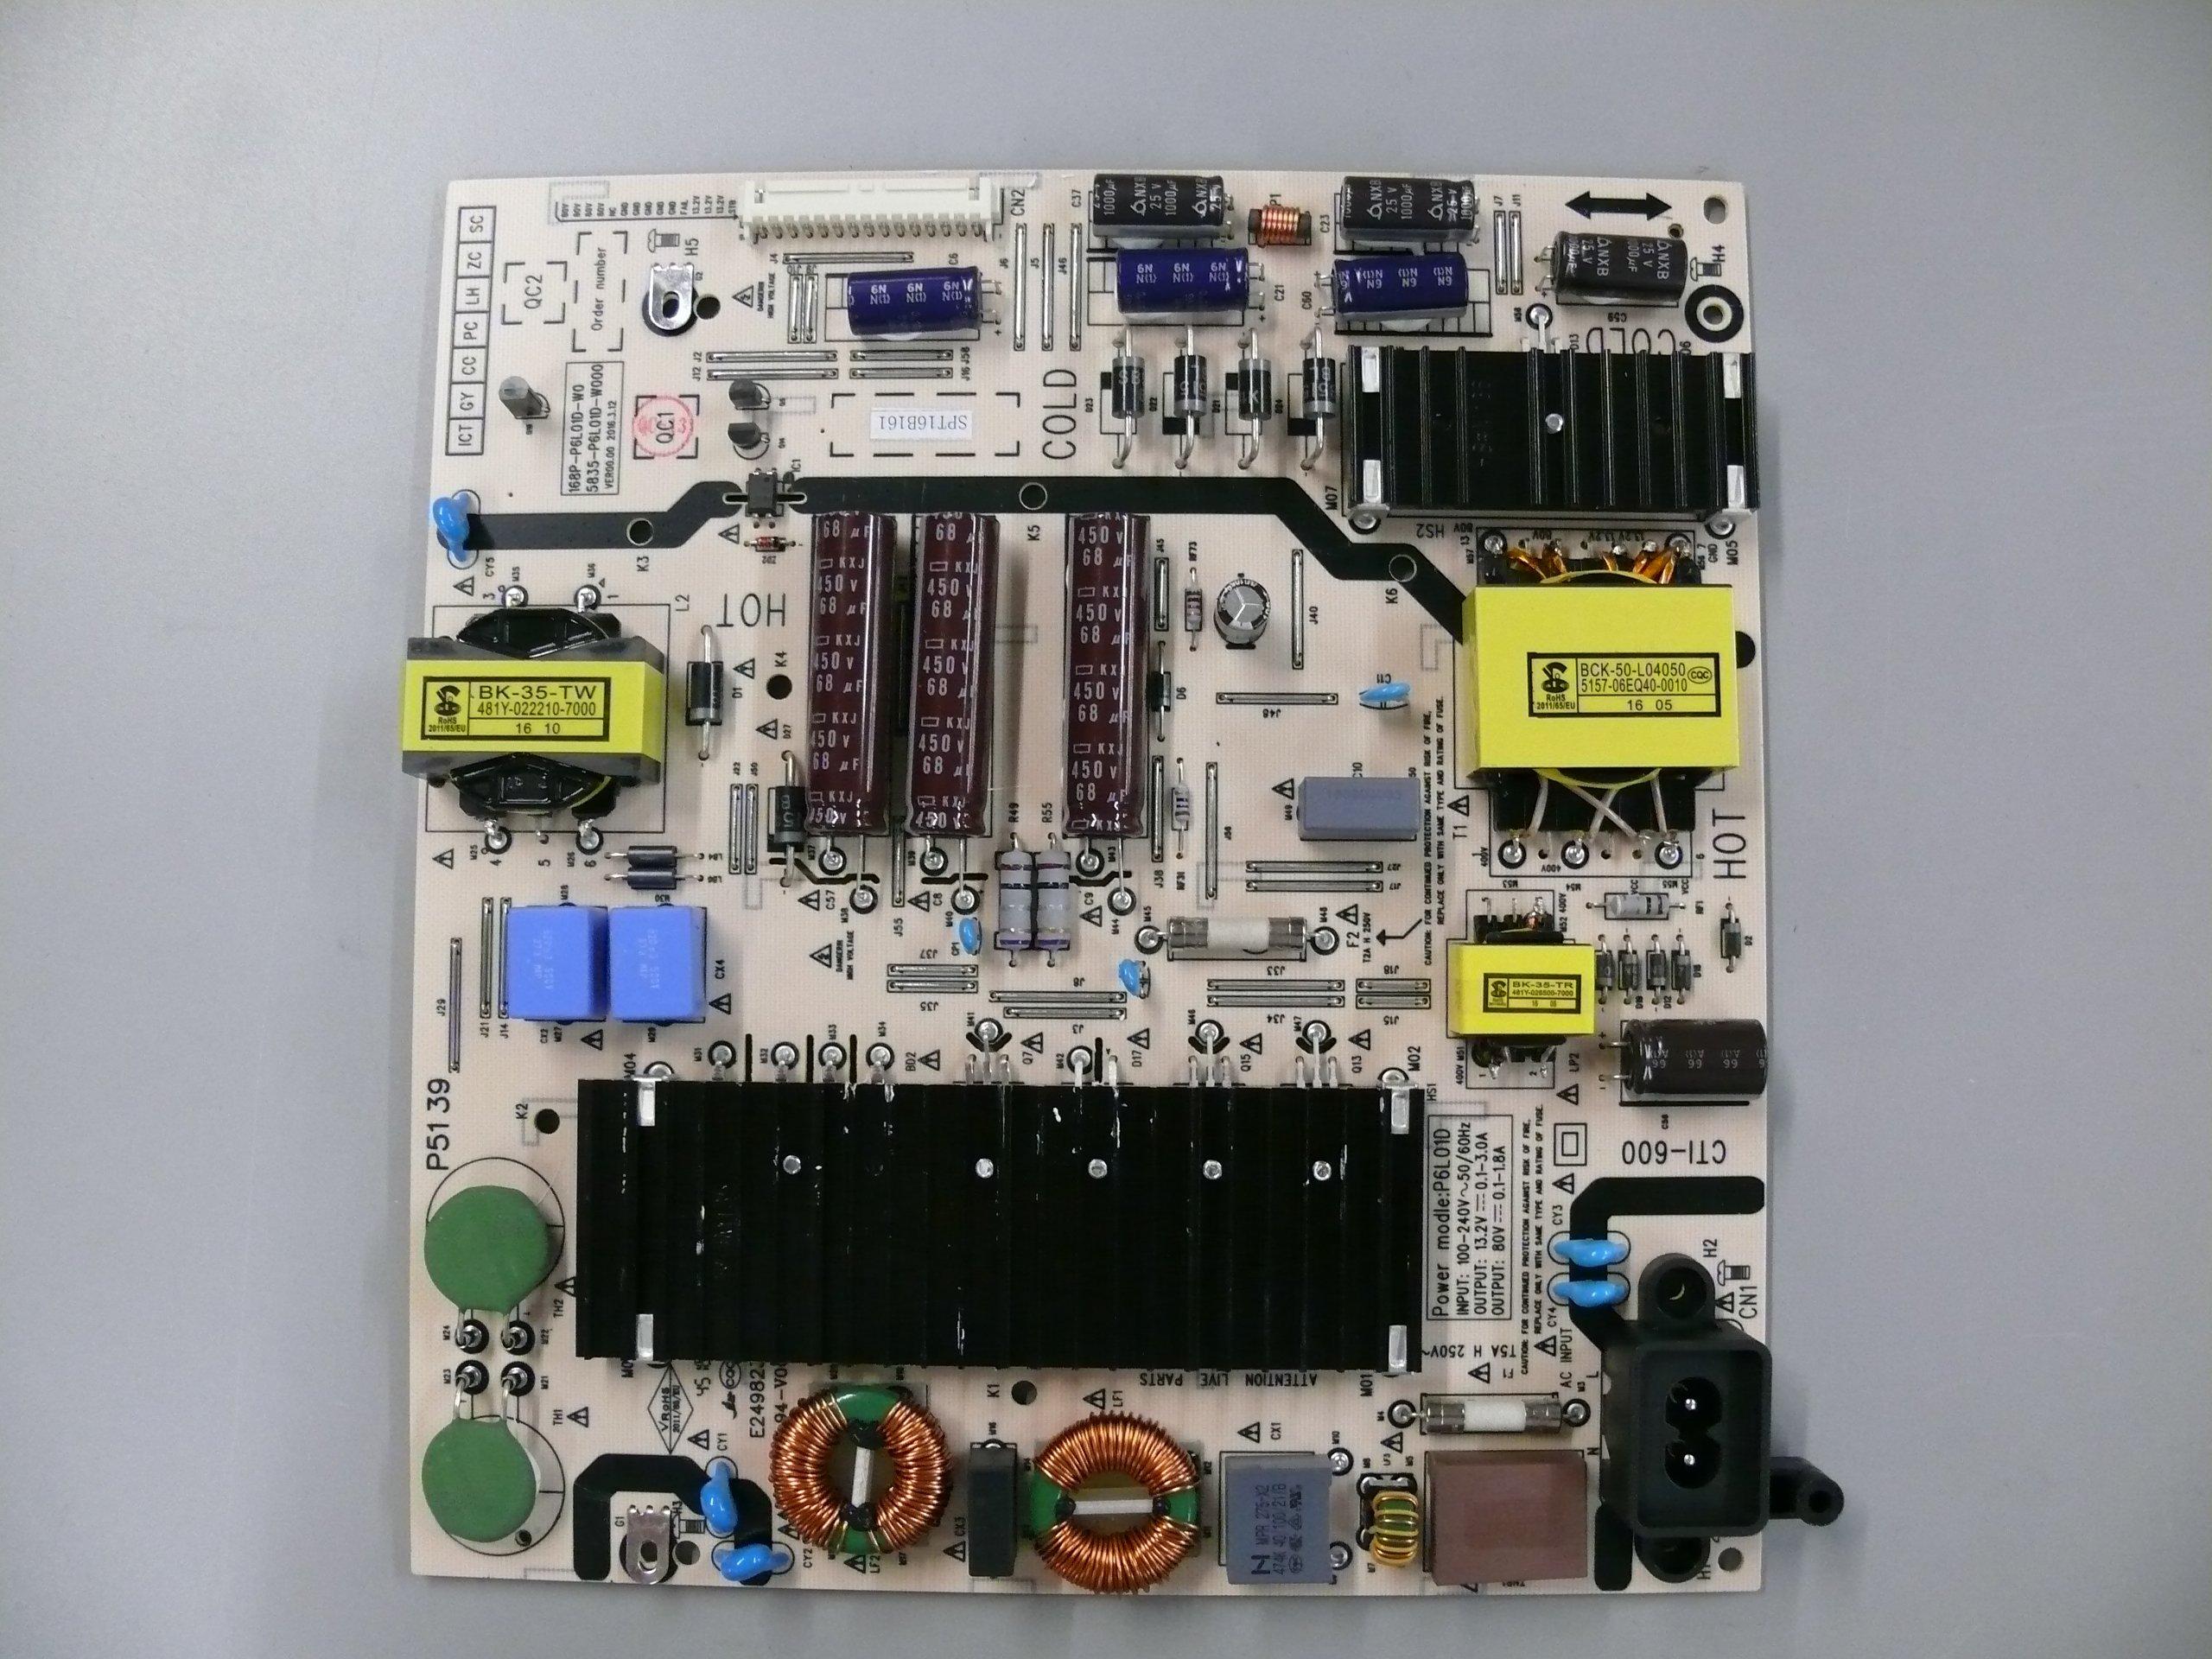 LG TELEVISION POWER SUPPLY BOARD, COV33699401